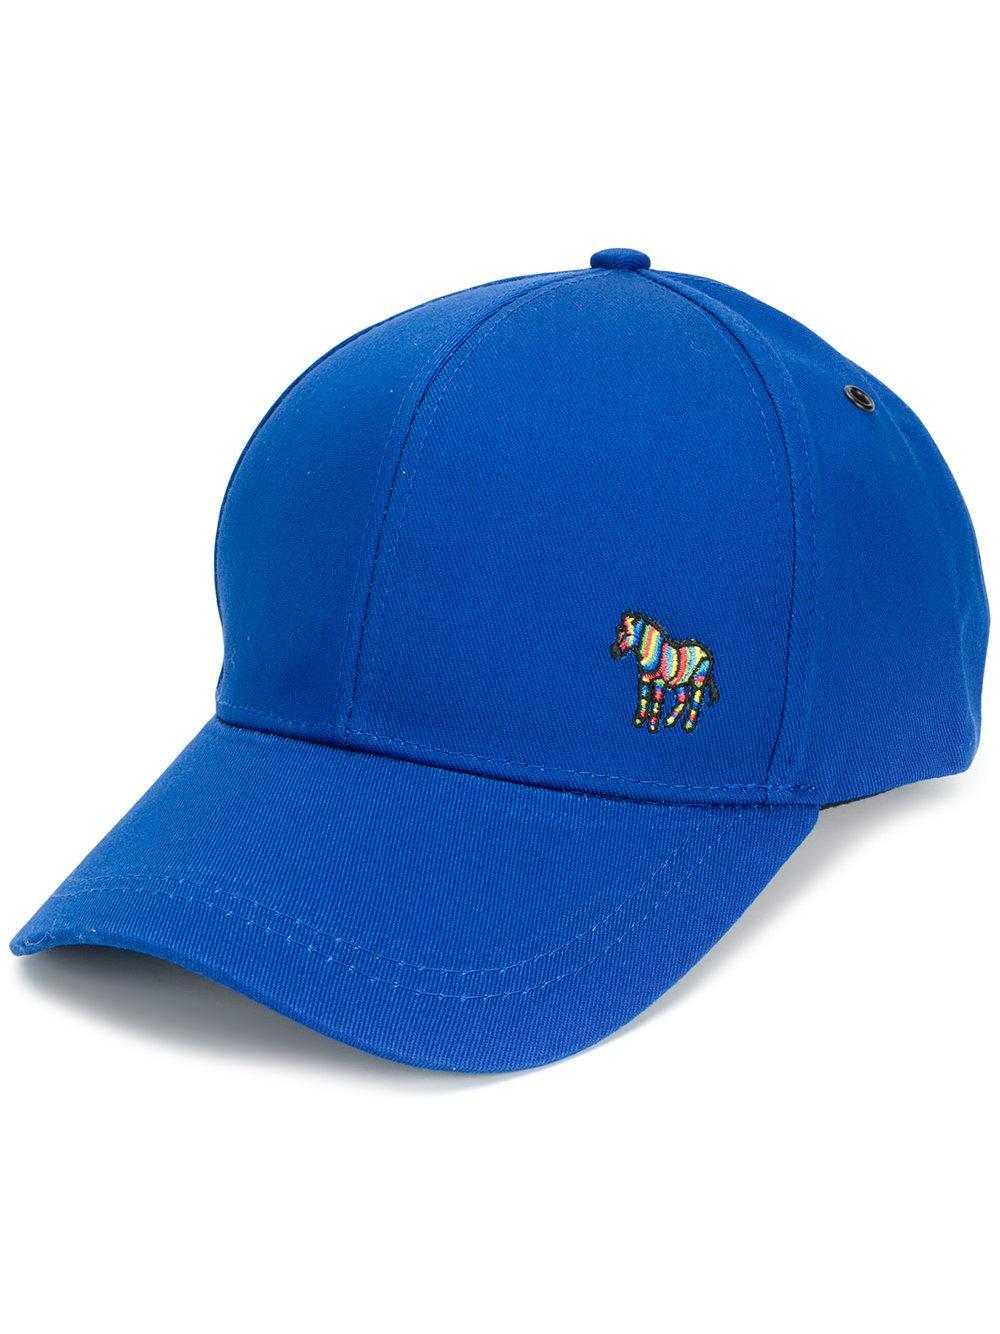 88c13df468a Lyst - Paul Smith Hat in Blue for Men